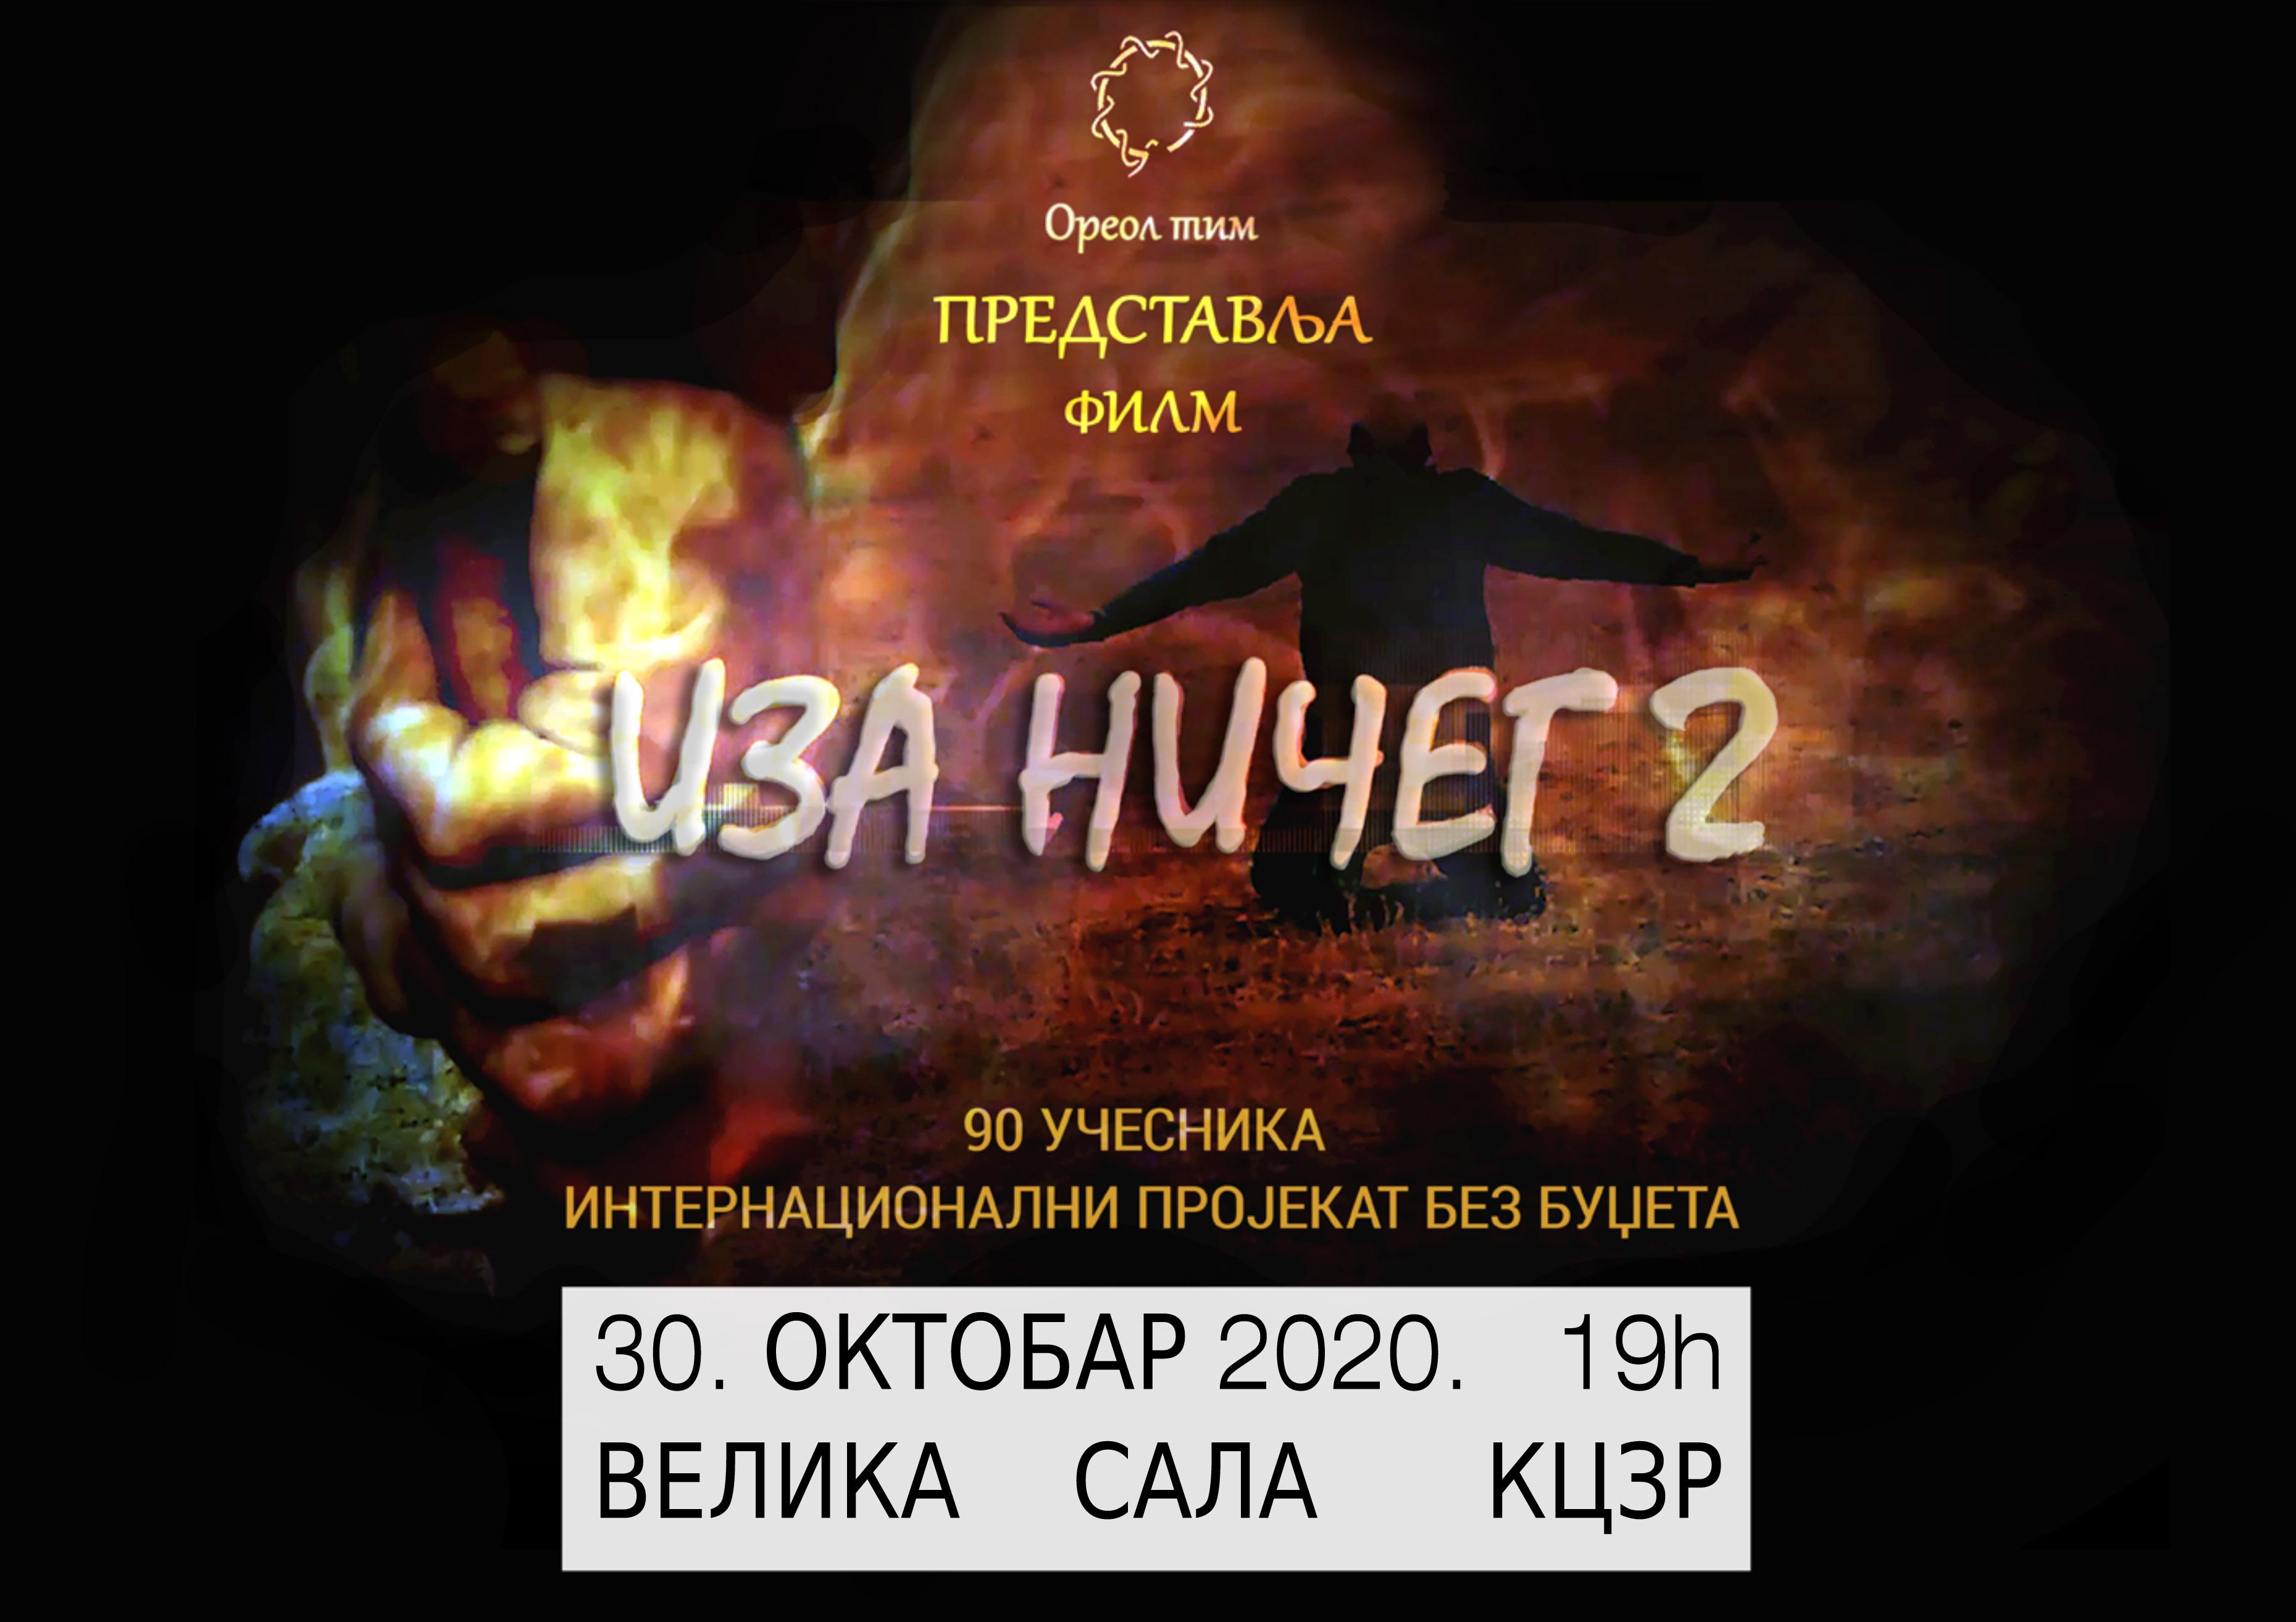 film Iza niceg 2 30. 10. 2020. KCZR